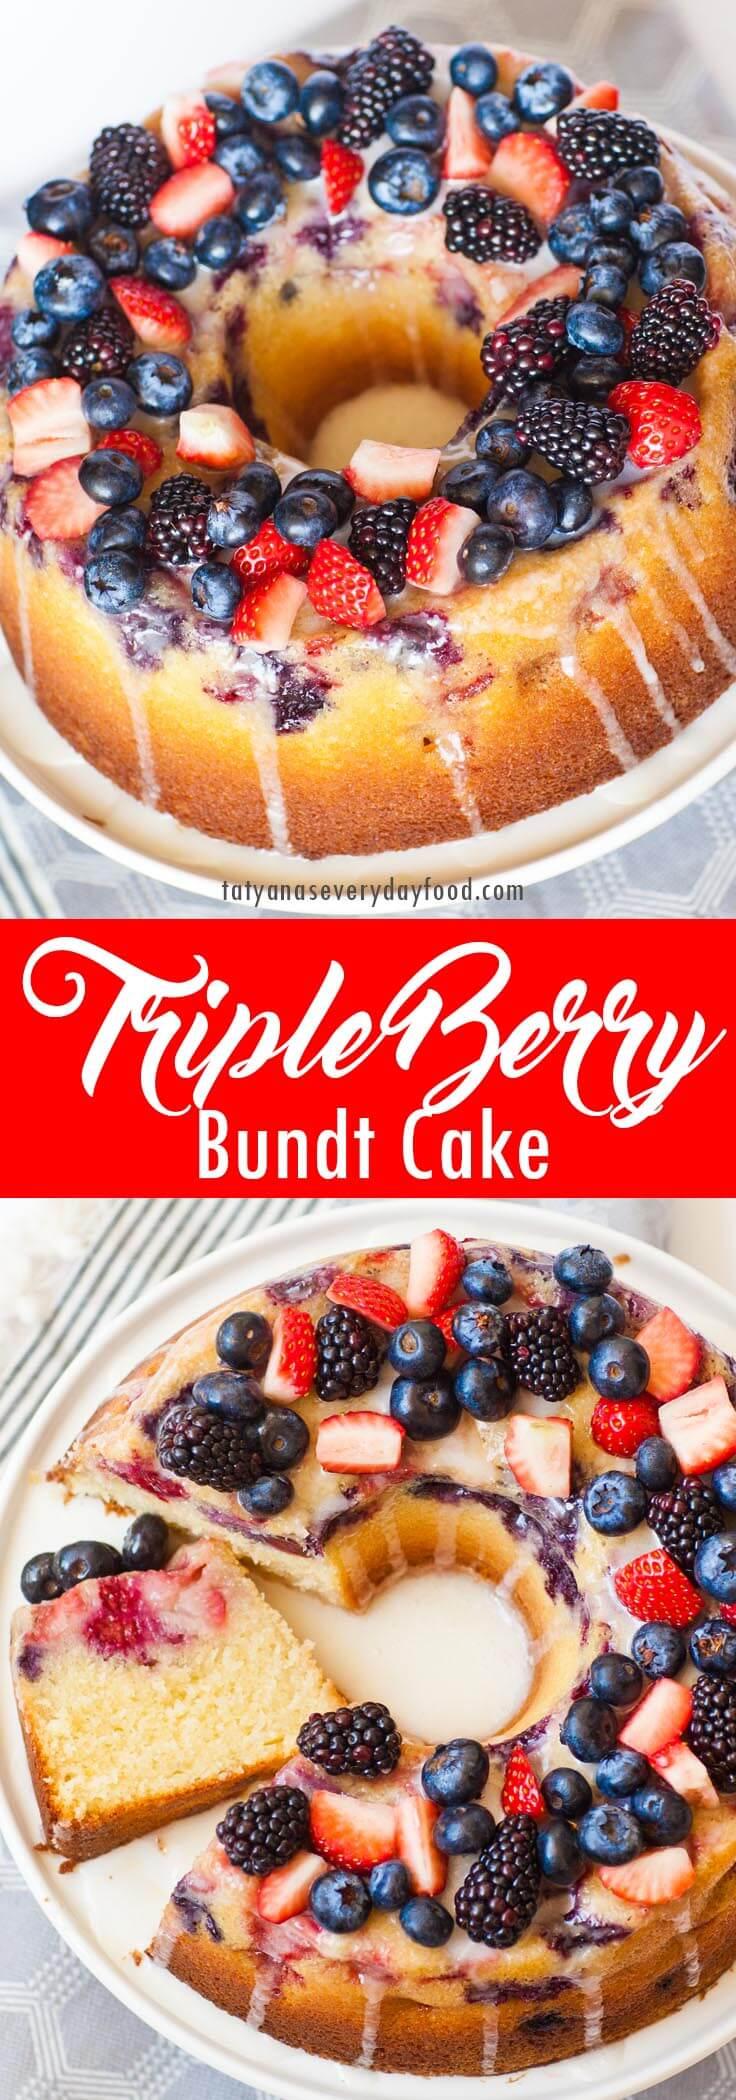 Triple Berry Bundt Cake video recipe